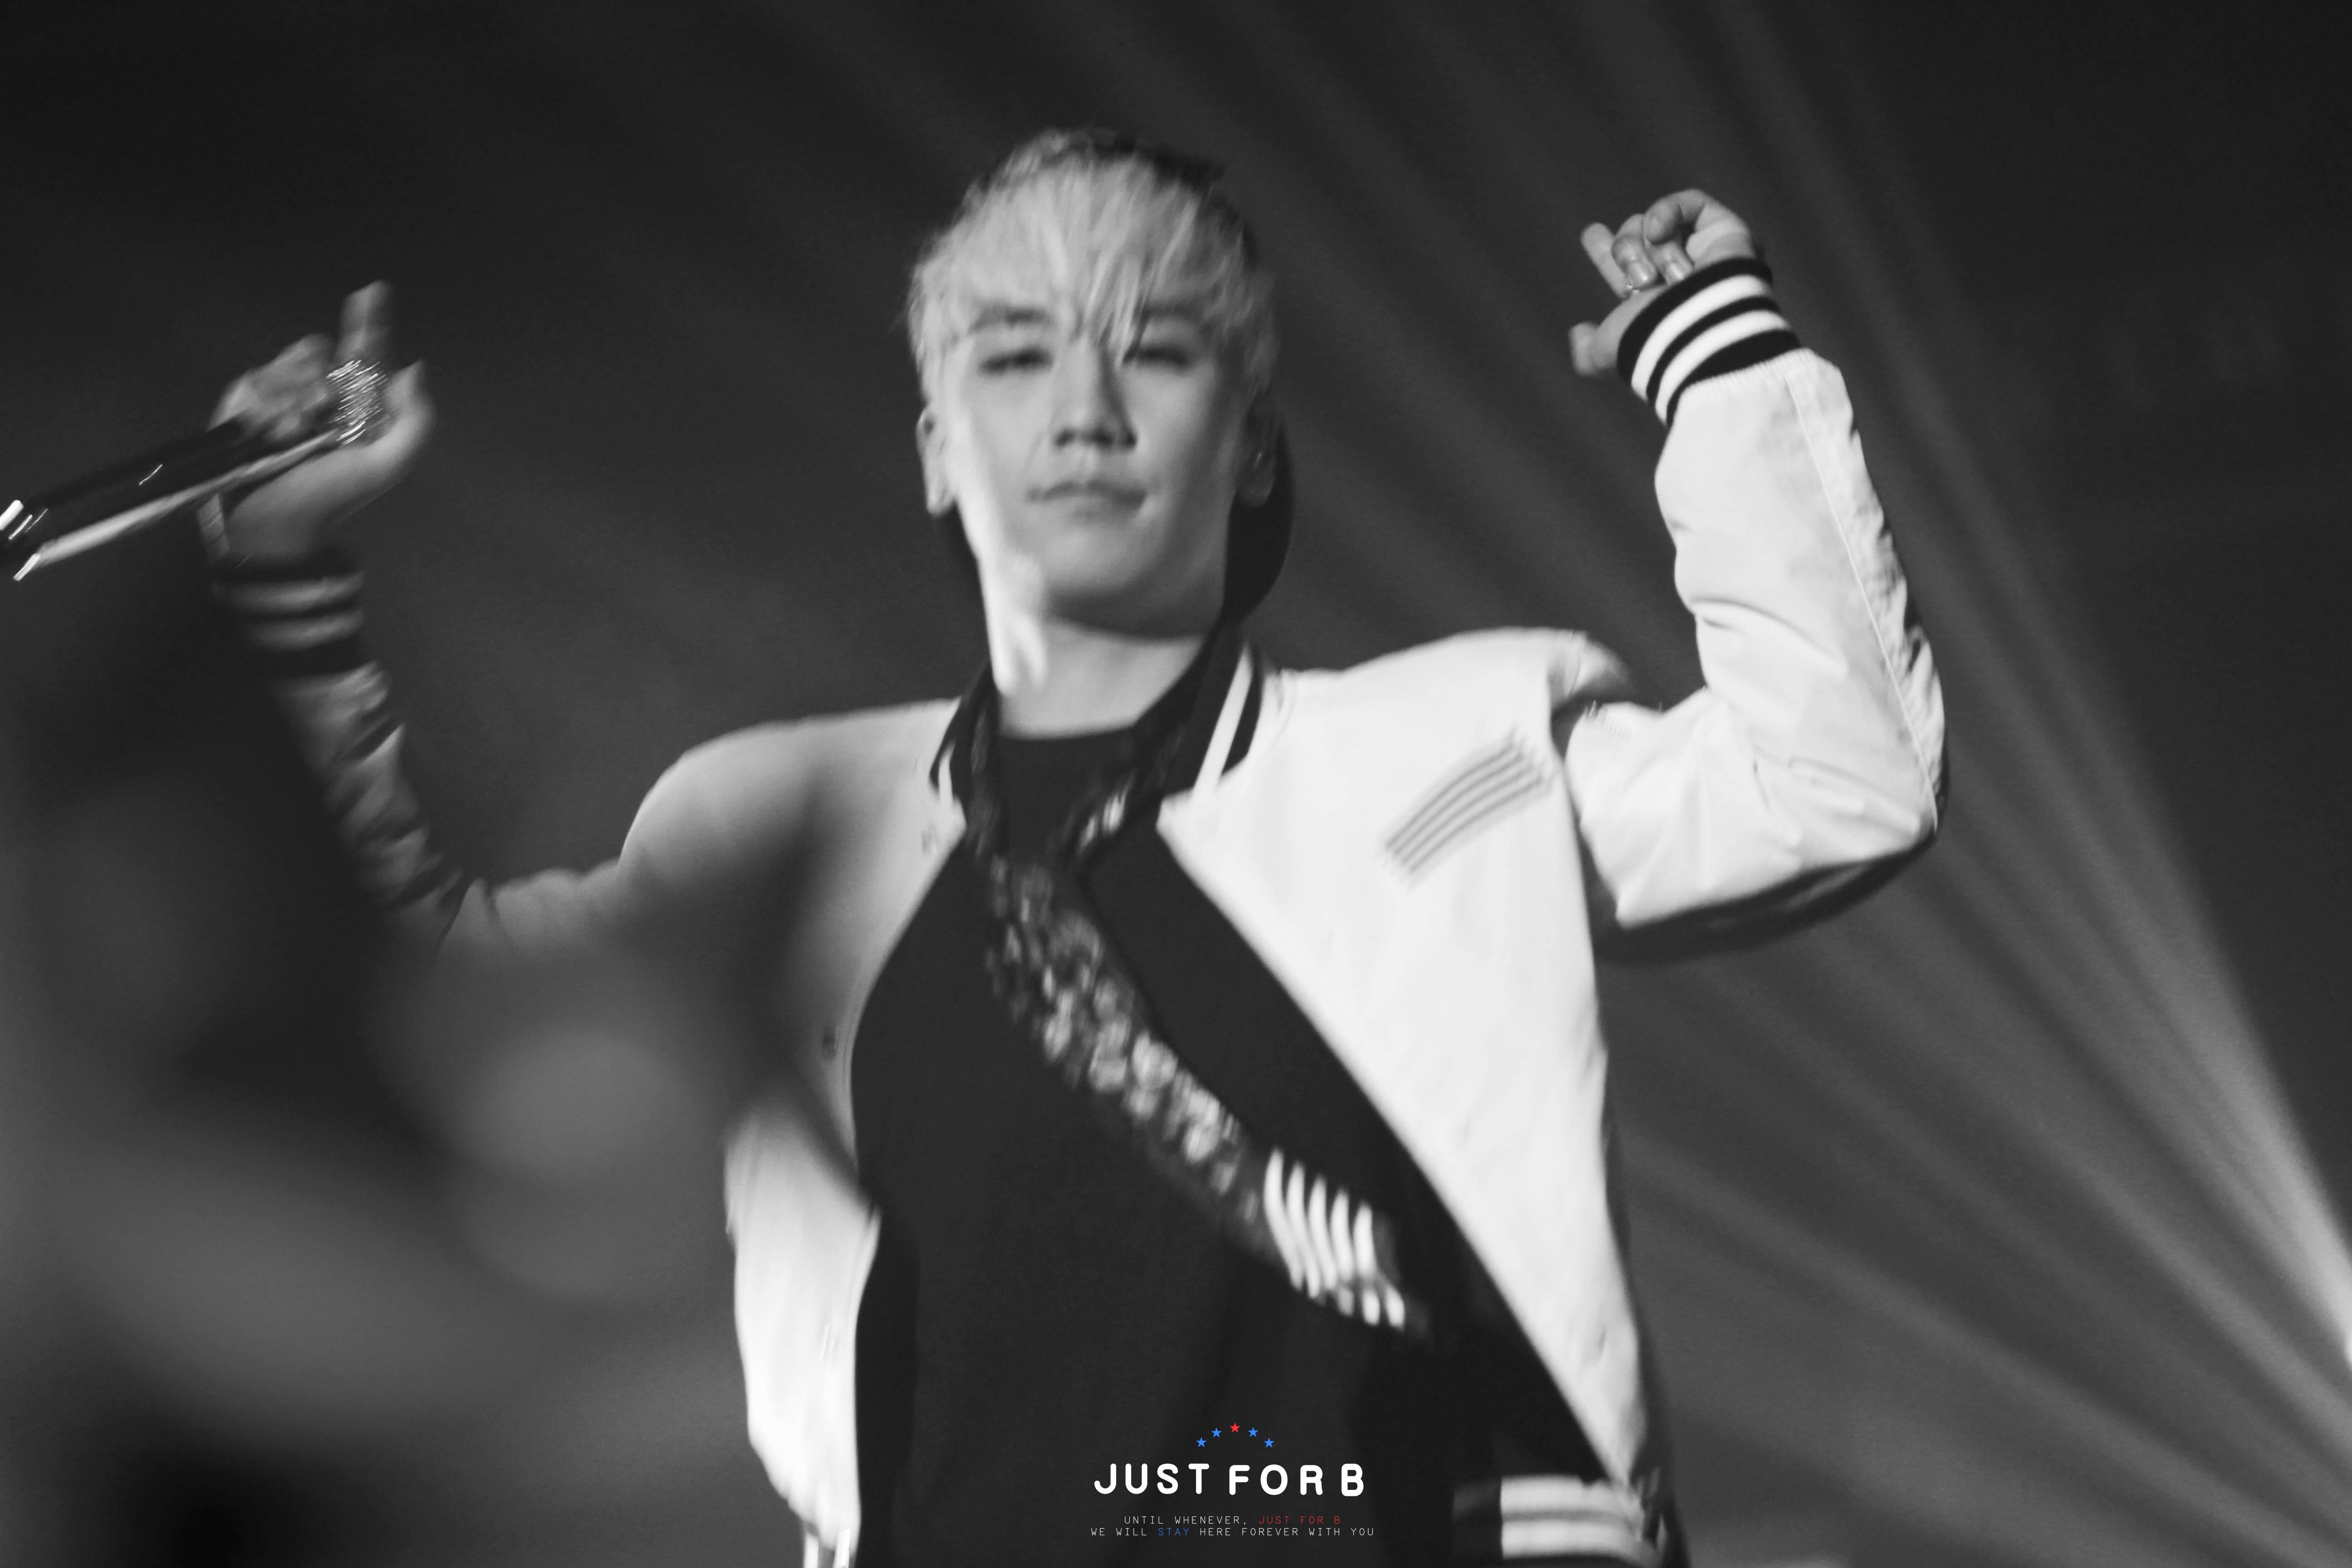 BIGBANG Seoul Day 2 HQs 2015-04-26 Seoul various138.jpg